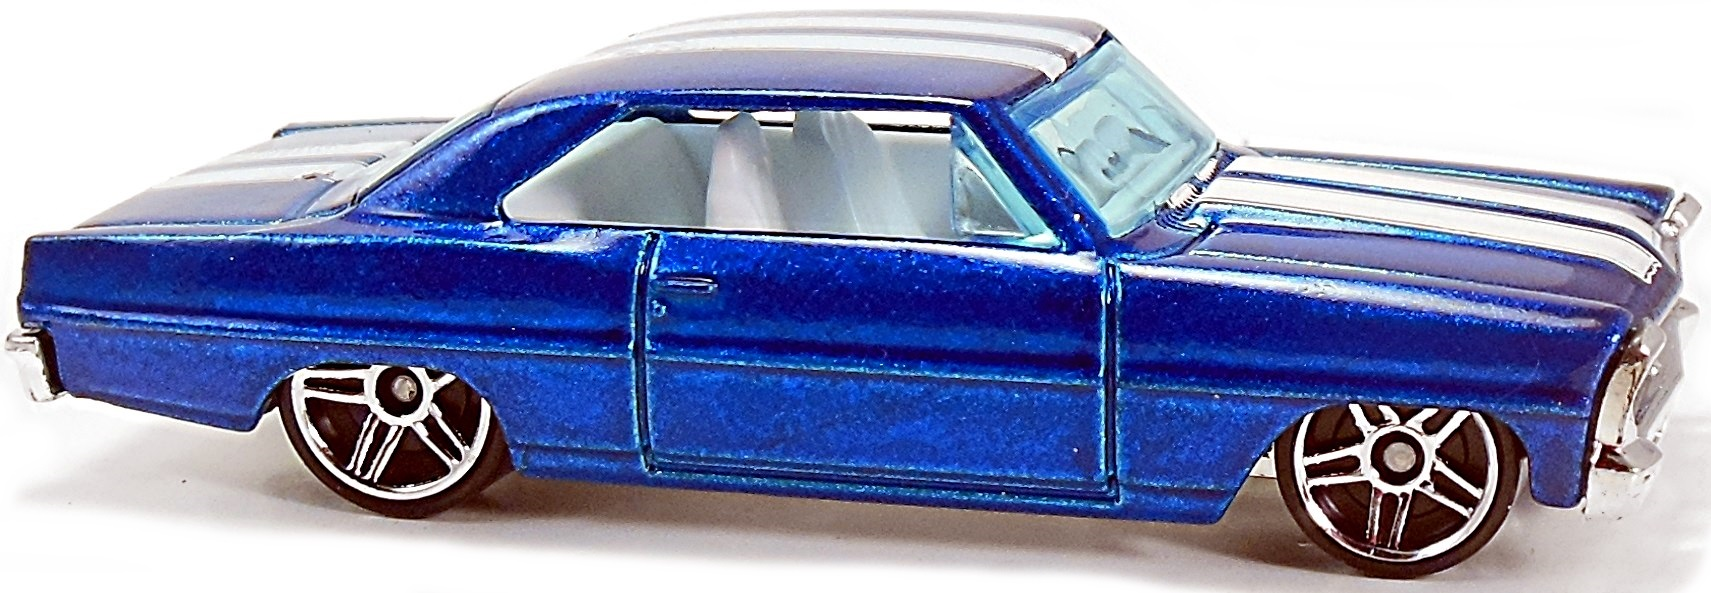 66 67 Chevy Nova 77mm 2007 Hot Wheels Newsletter